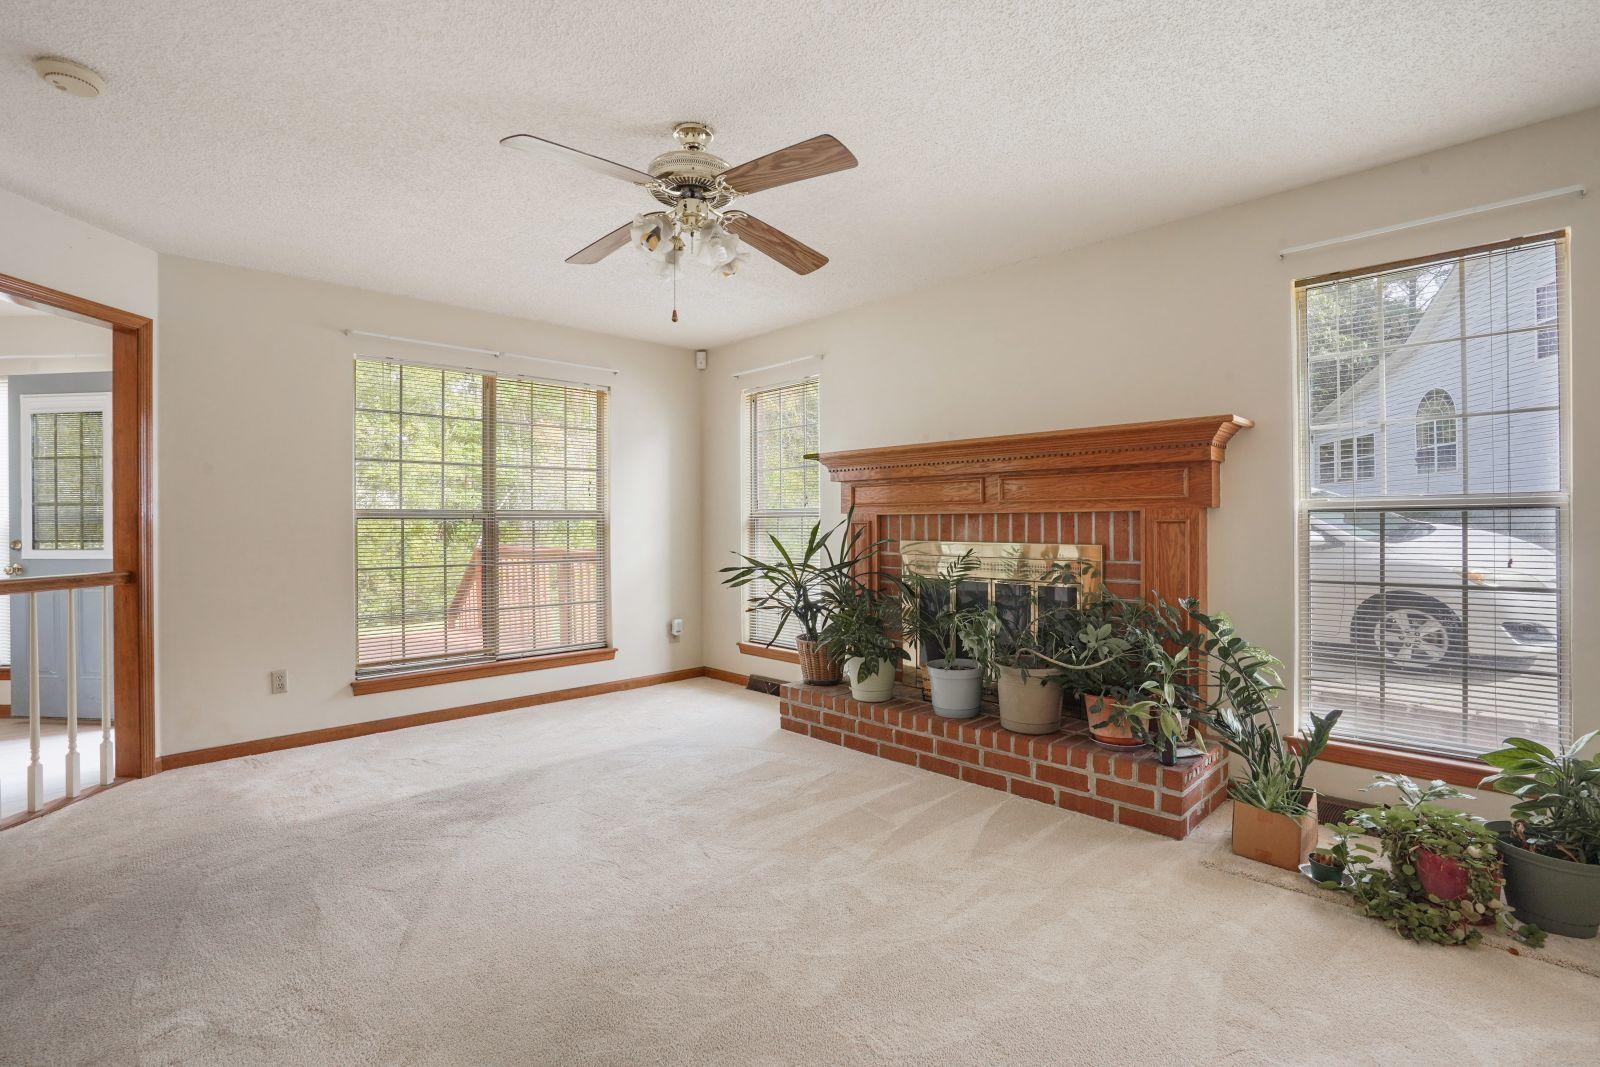 Crowfield Plantation Homes For Sale - 161 Belleplaine, Goose Creek, SC - 10